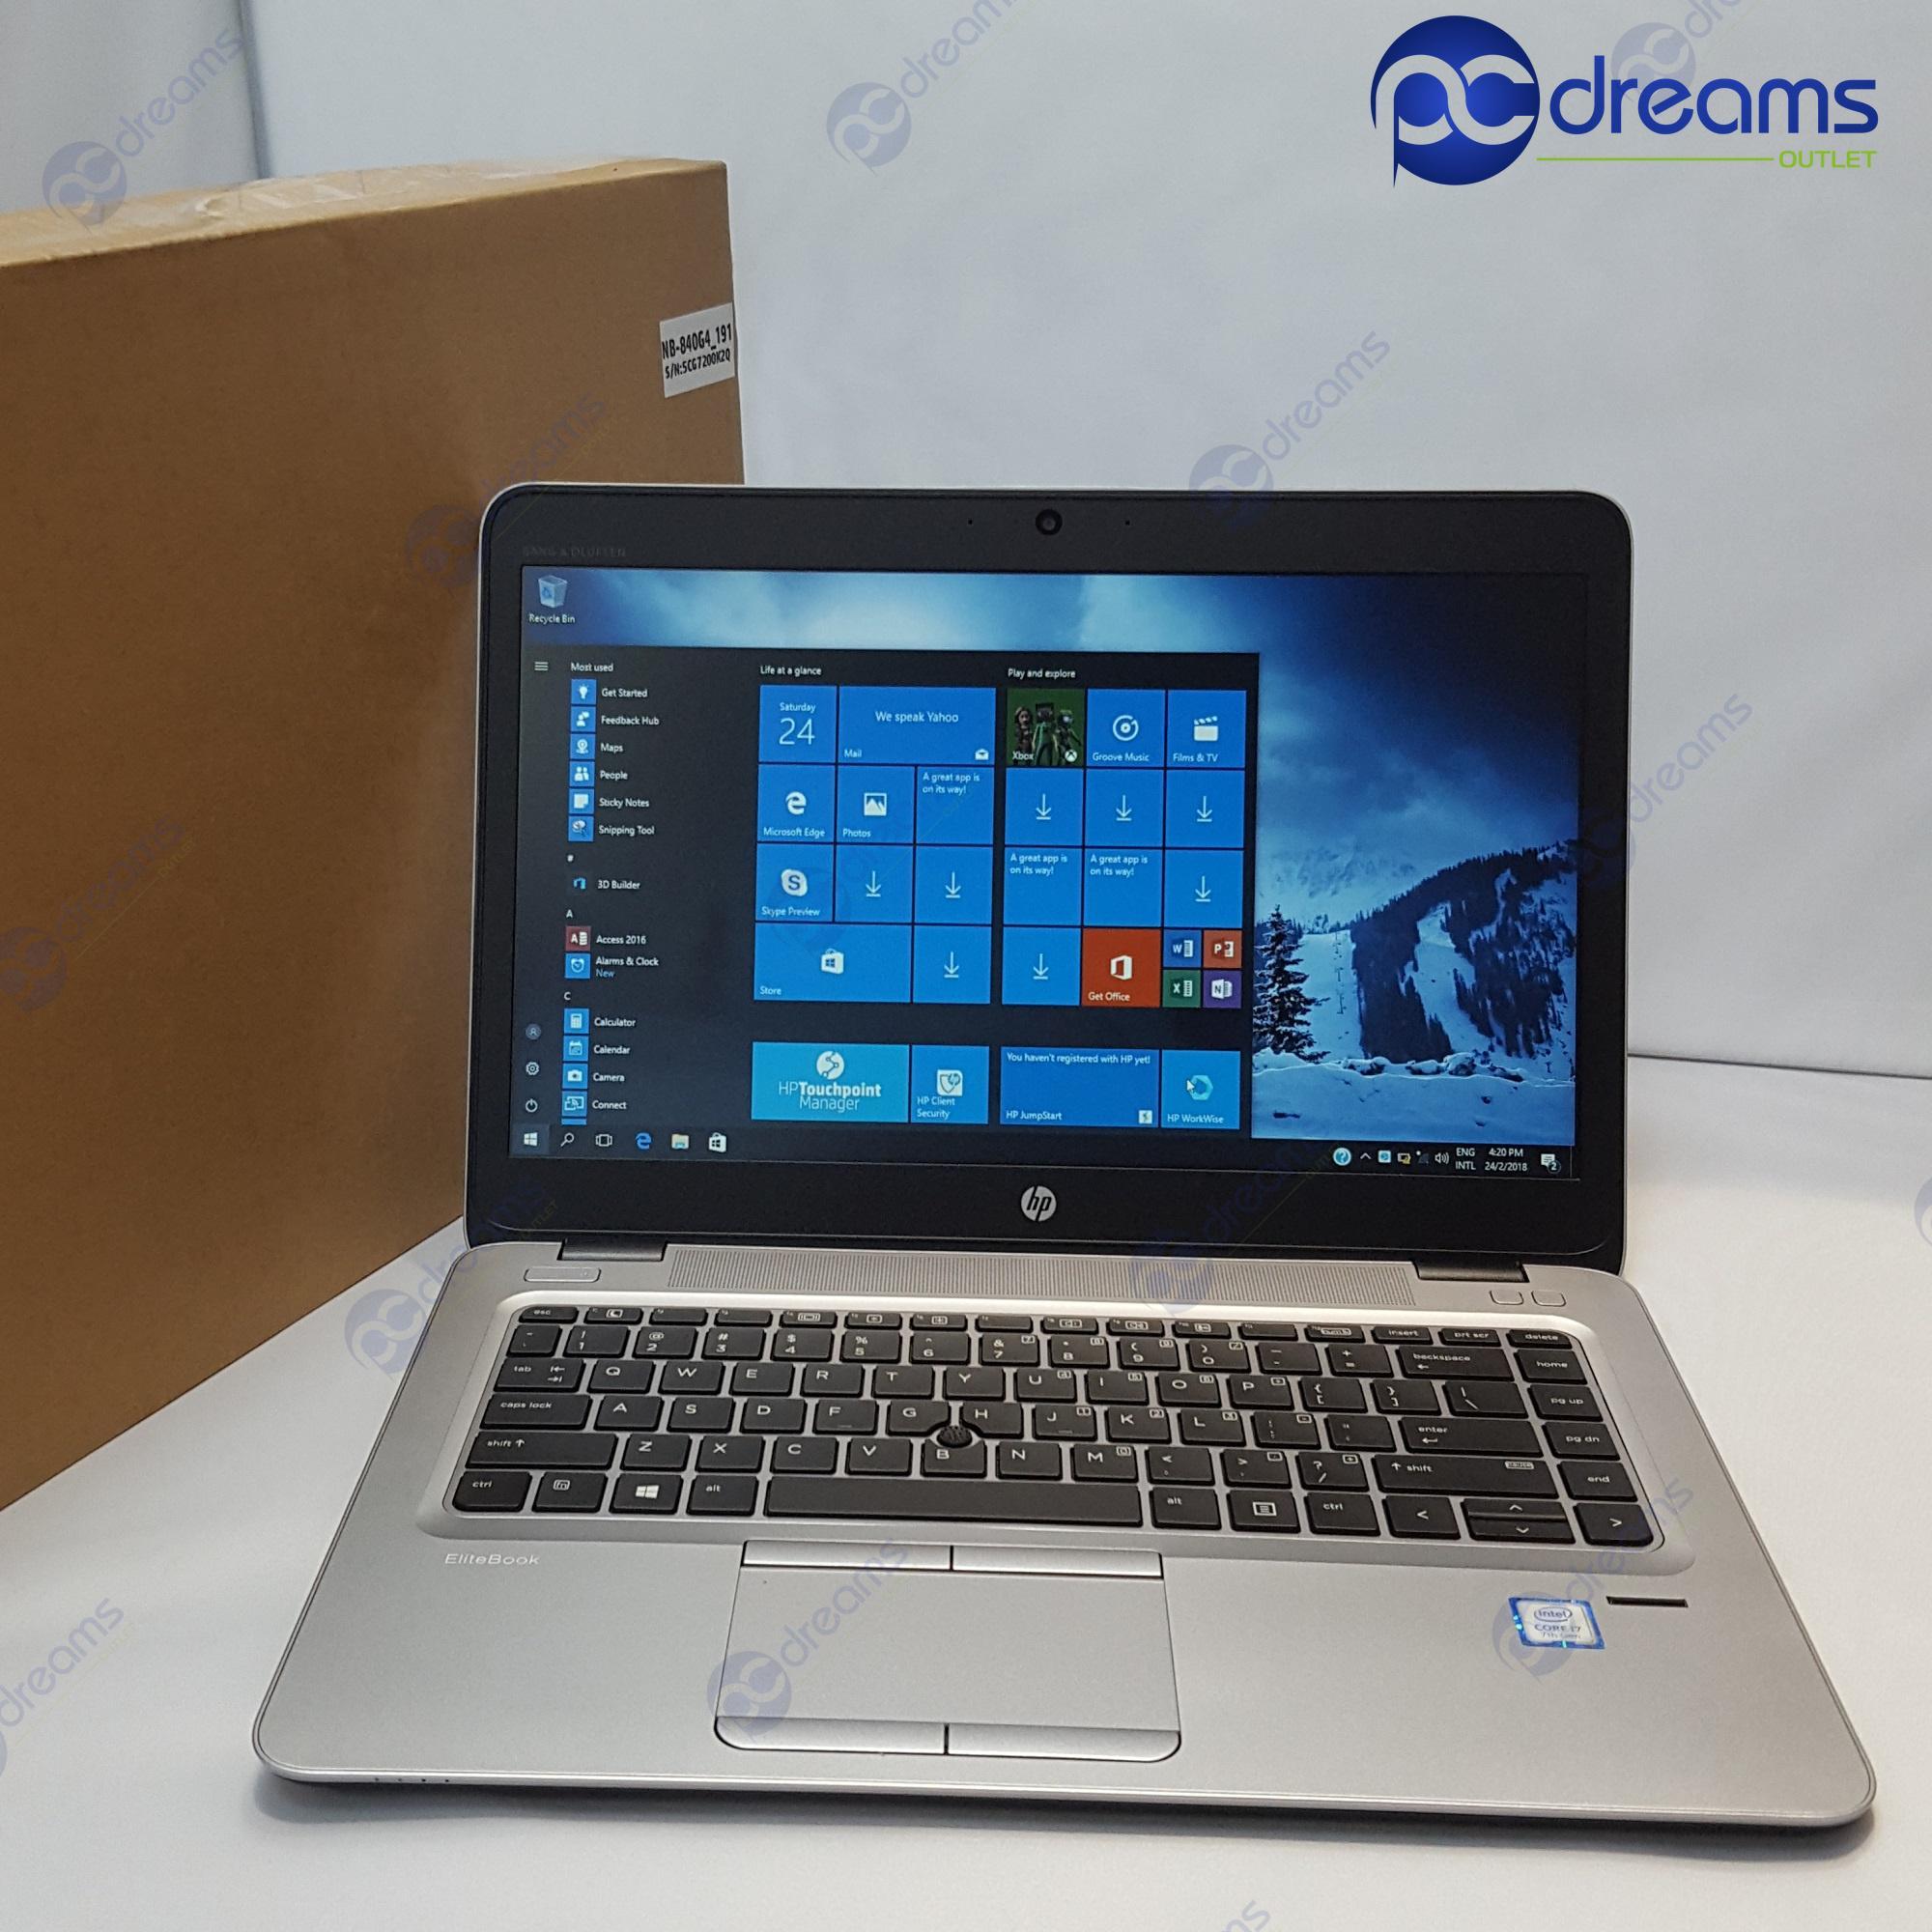 COMEX 2018! HP ELITEBOOK 840 G4 (X3V02AV) i5-7200U/8GB/500GB HDD [Premium Refreshed]